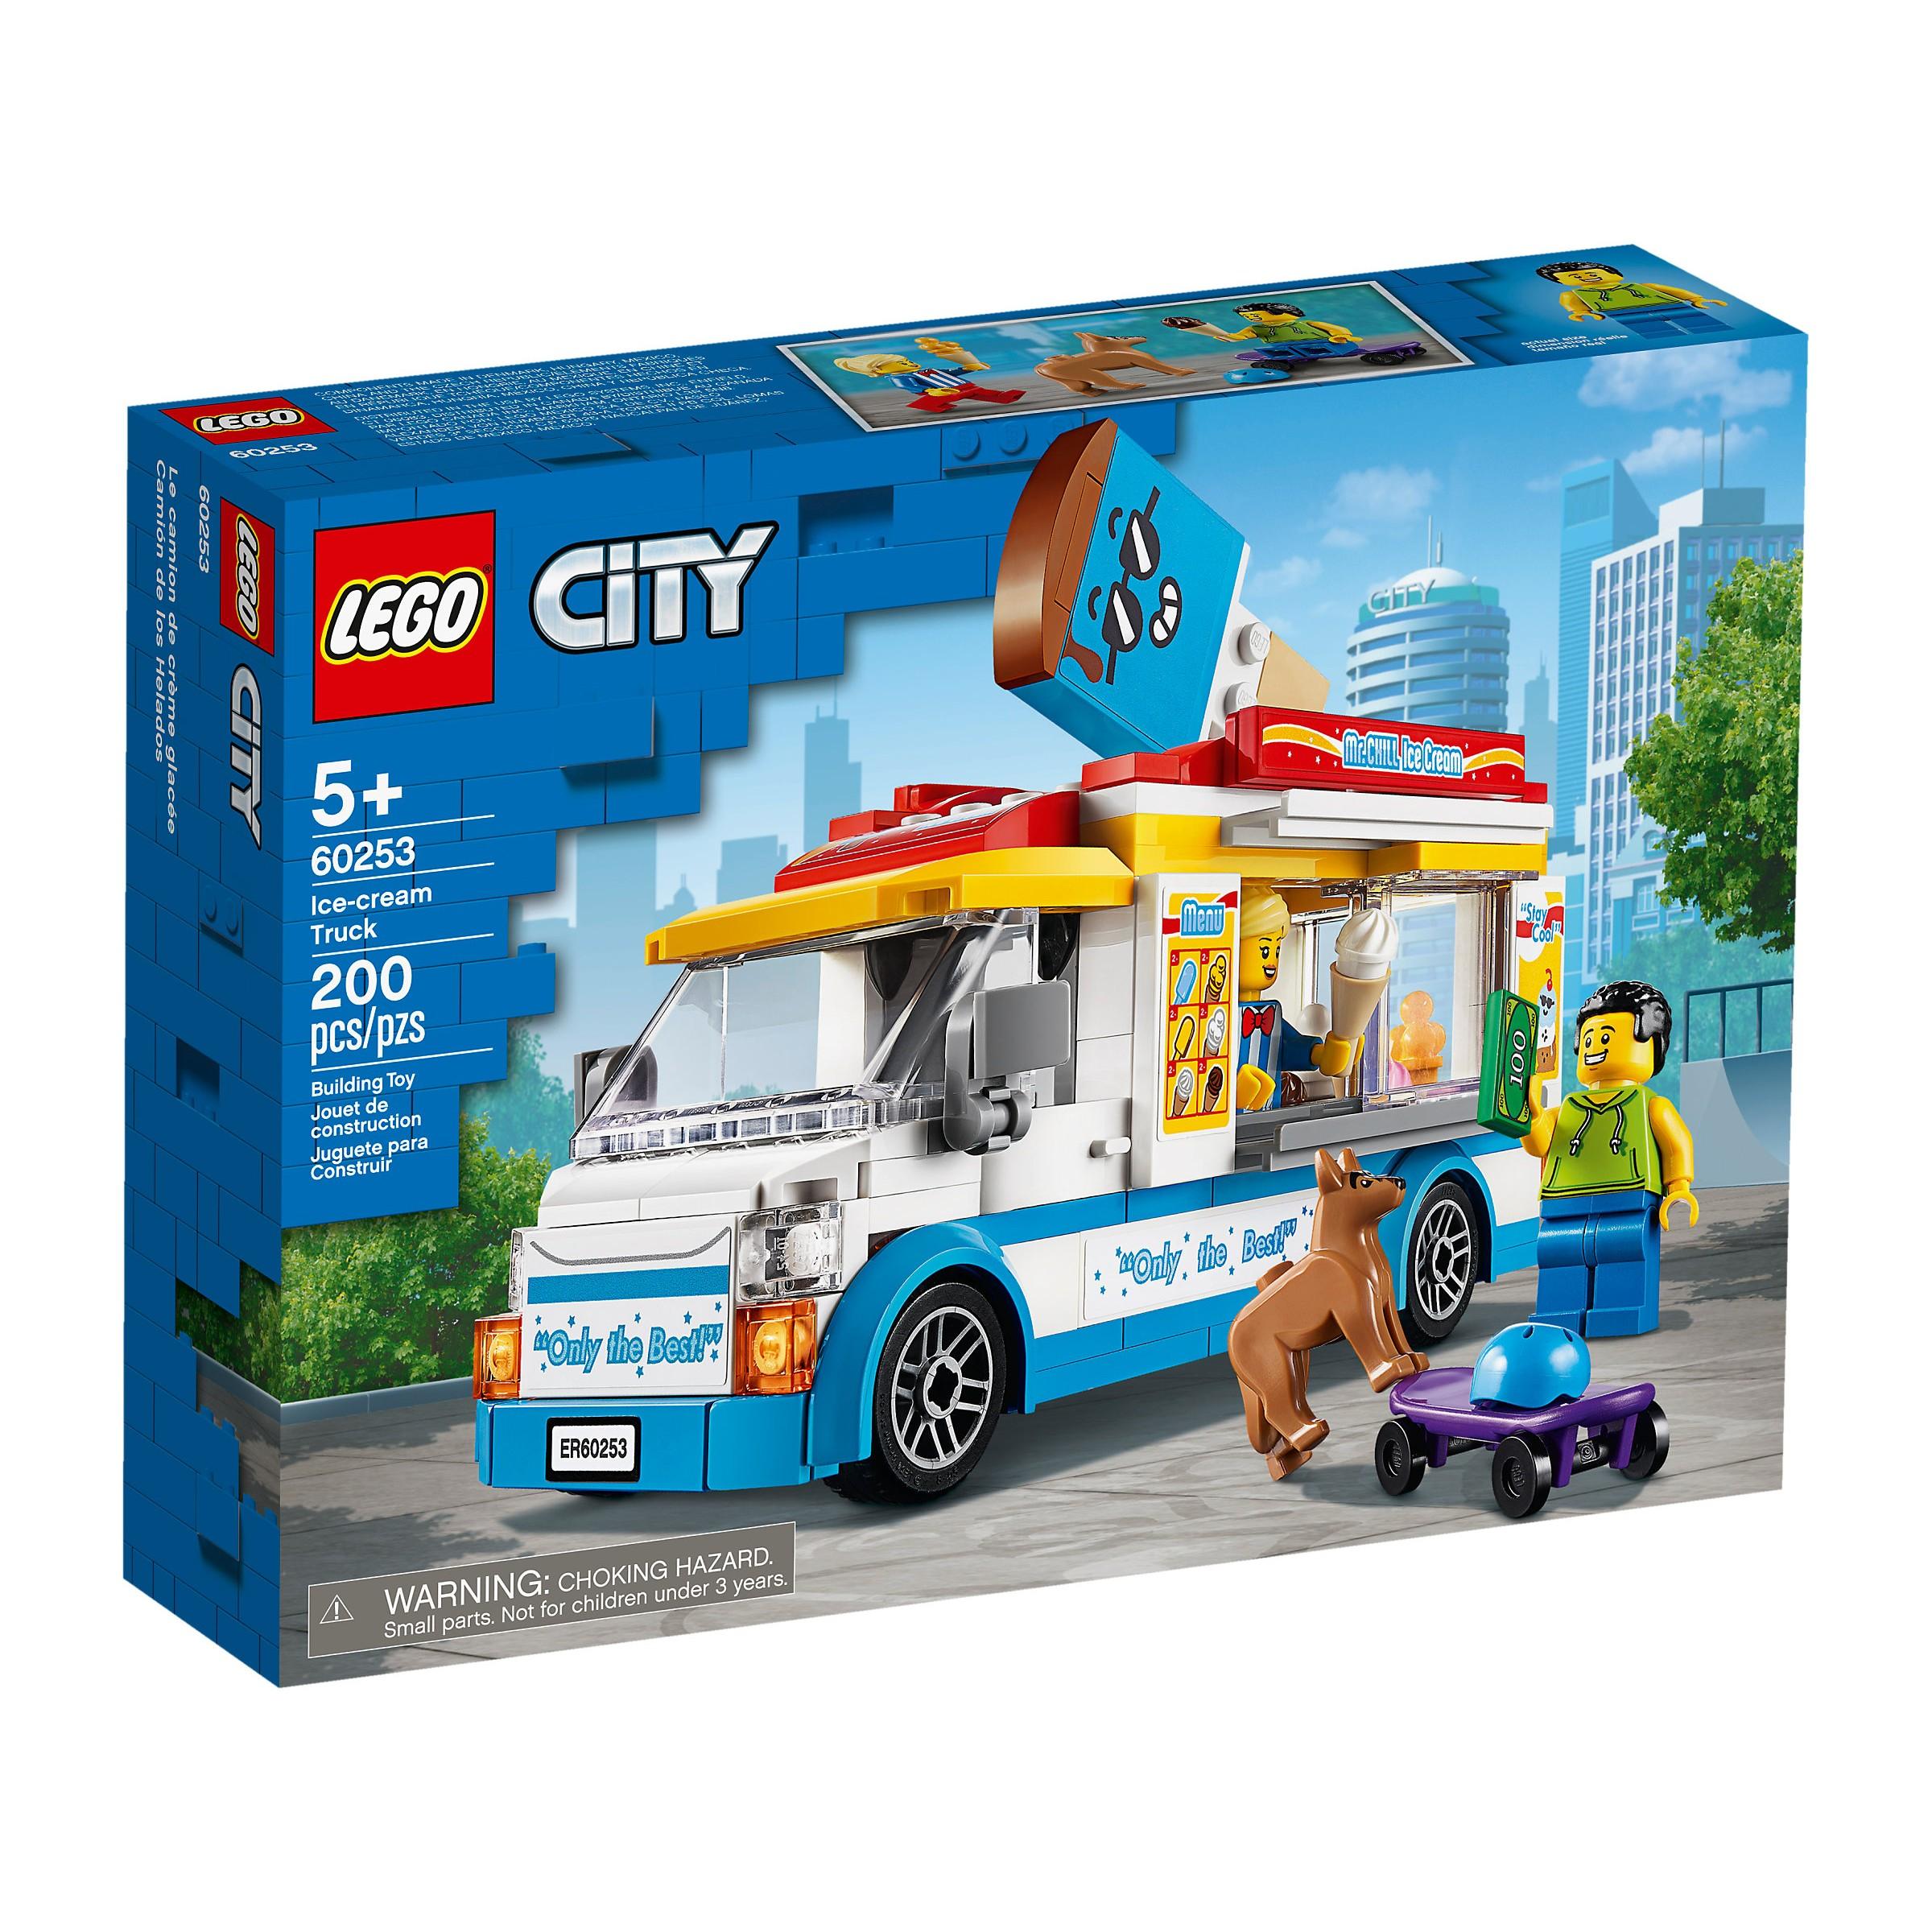 LEGO 60253 City Ice-Cream Truck at Toys R Us